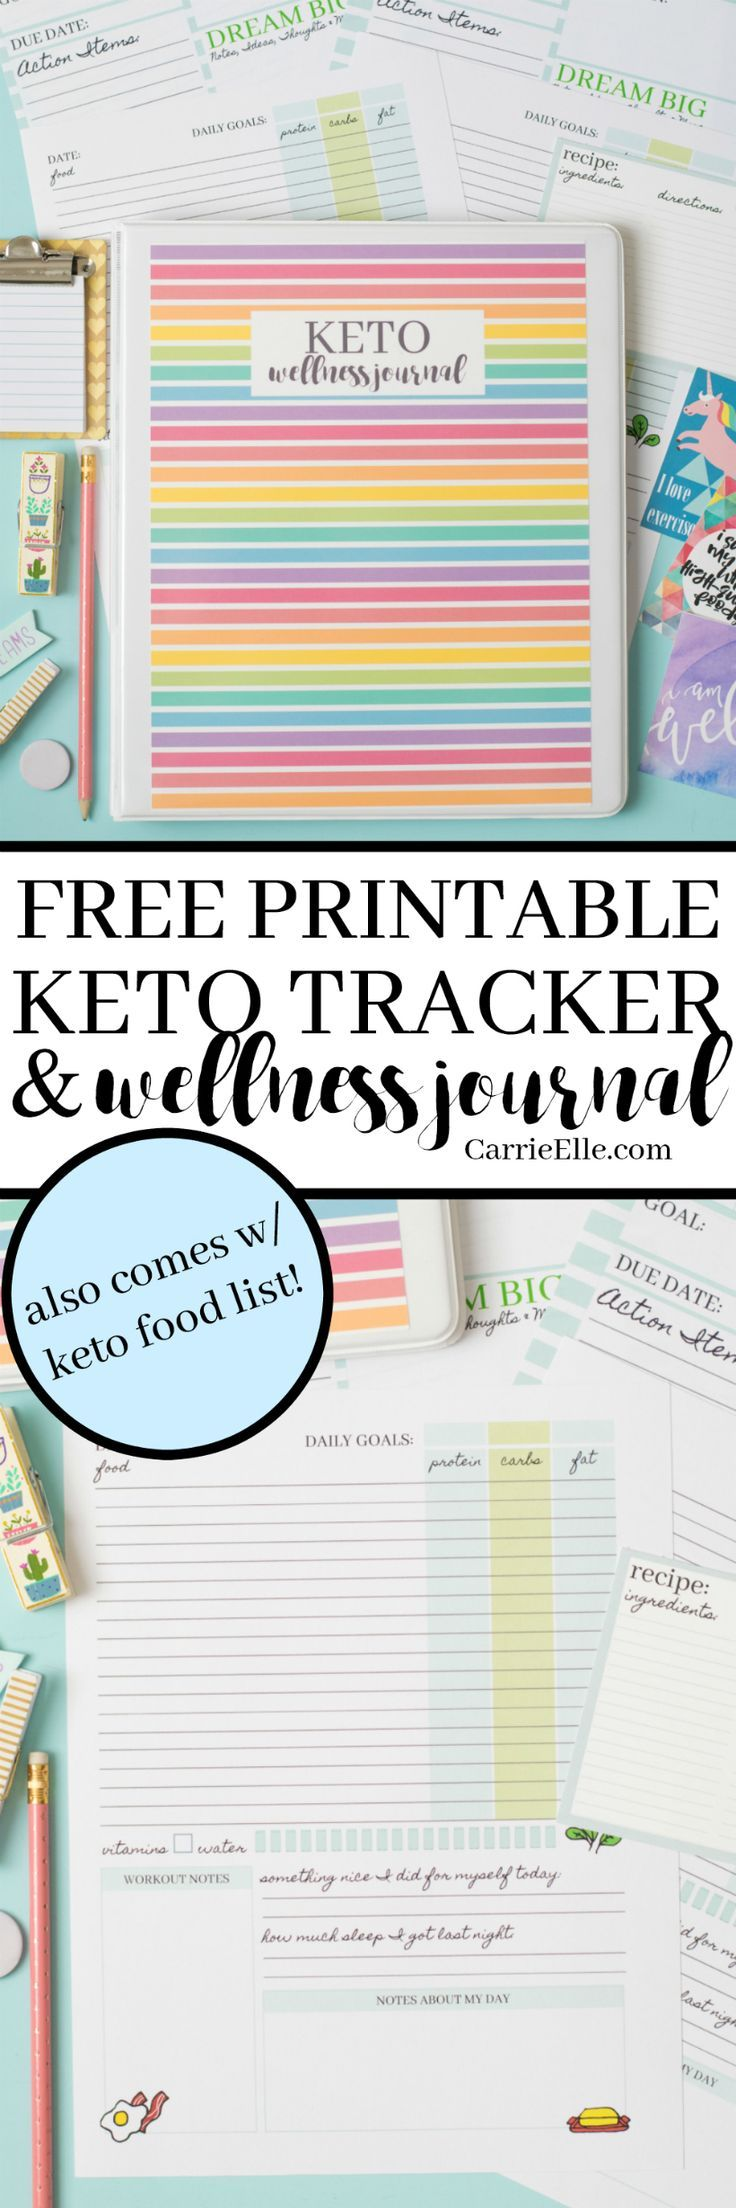 keto diet tracker free